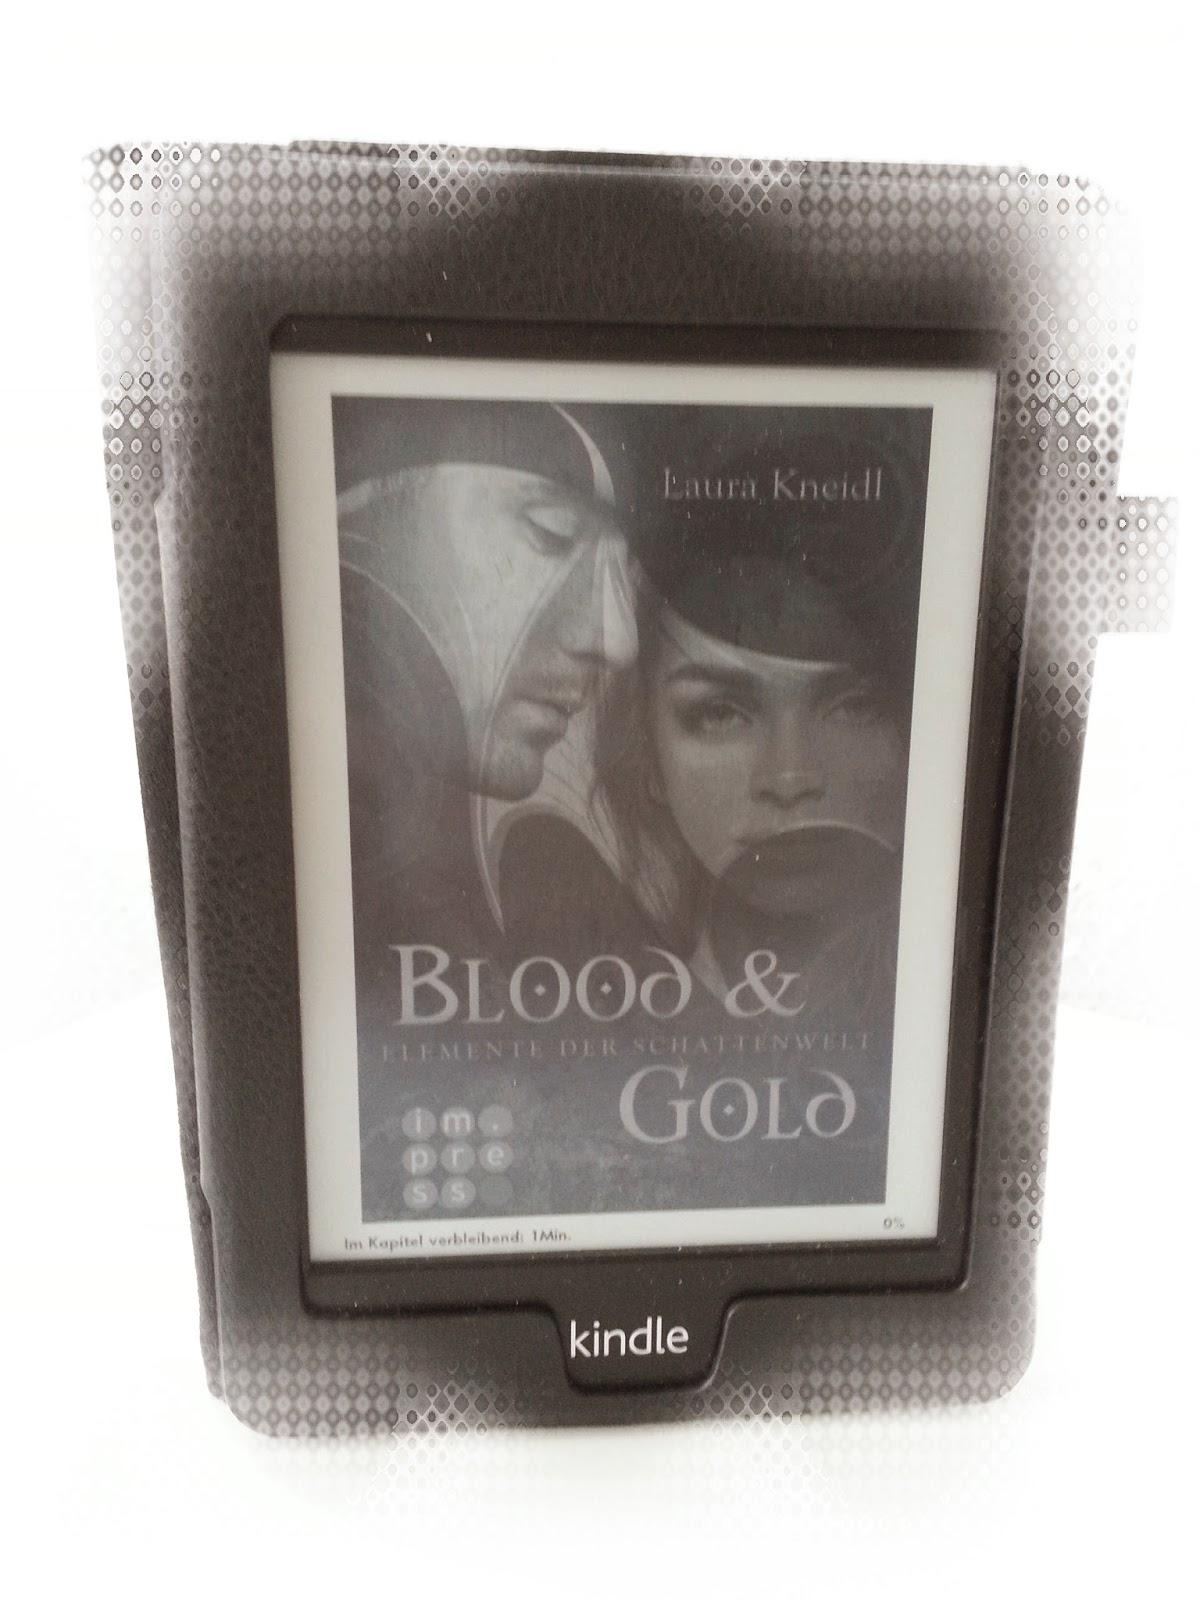 http://www.amazon.de/Elemente-Schattenwelt-Band-Blood-Gold-ebook/dp/B00JGS8GCQ/ref=sr_1_3?s=books&ie=UTF8&qid=1399920744&sr=1-3&keywords=blood+%26+gold